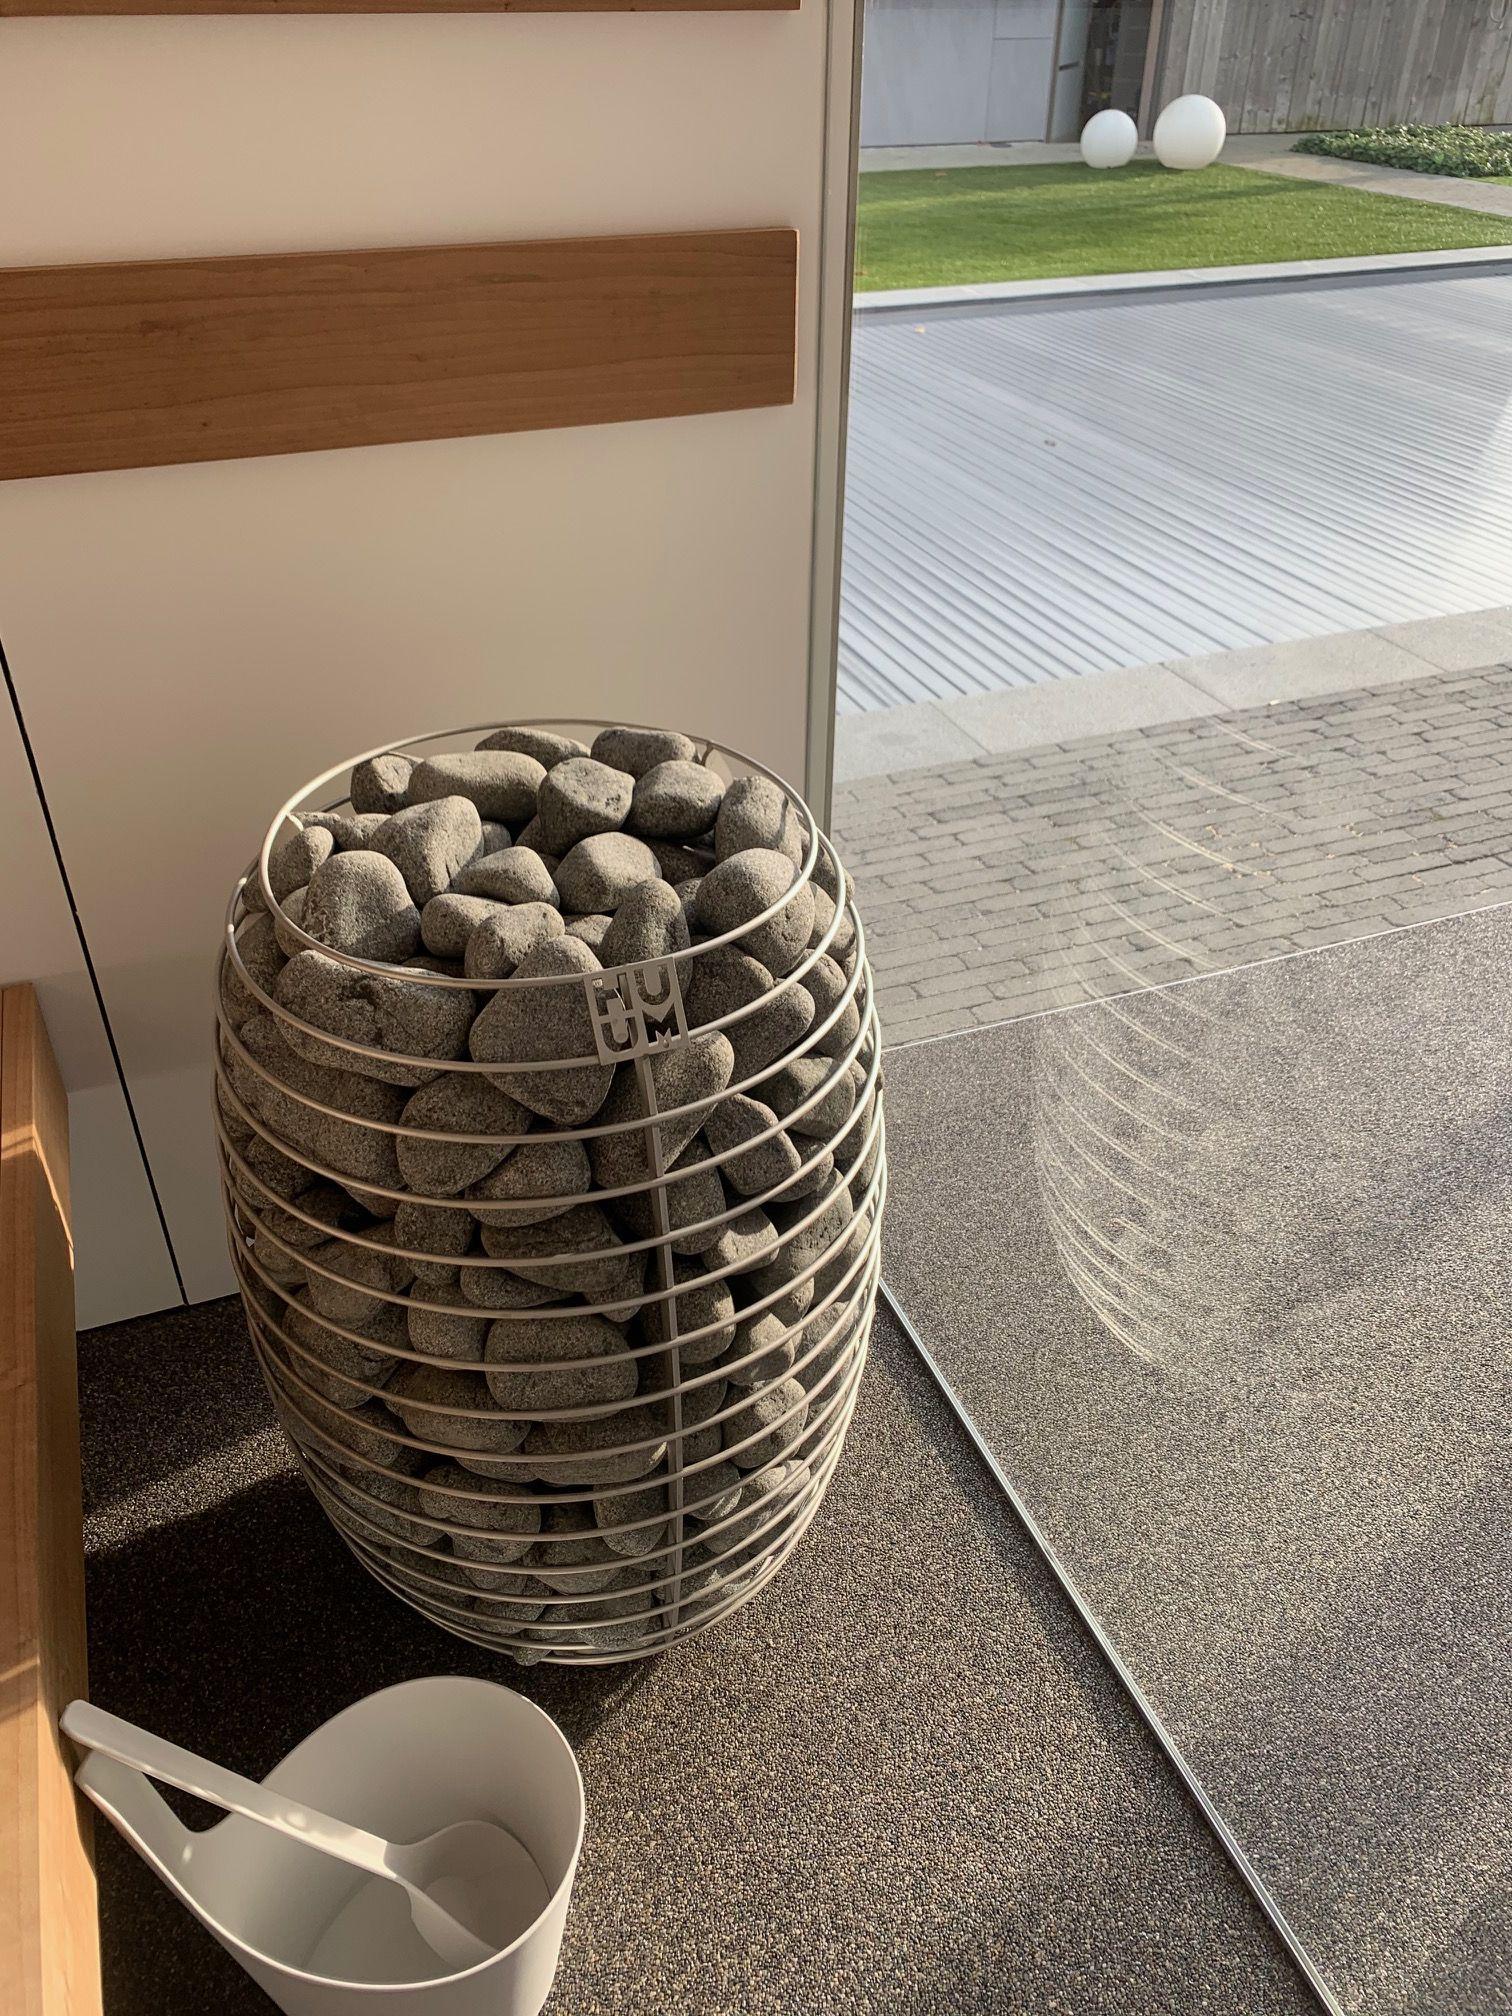 Hive electric sauna heater with images sauna design